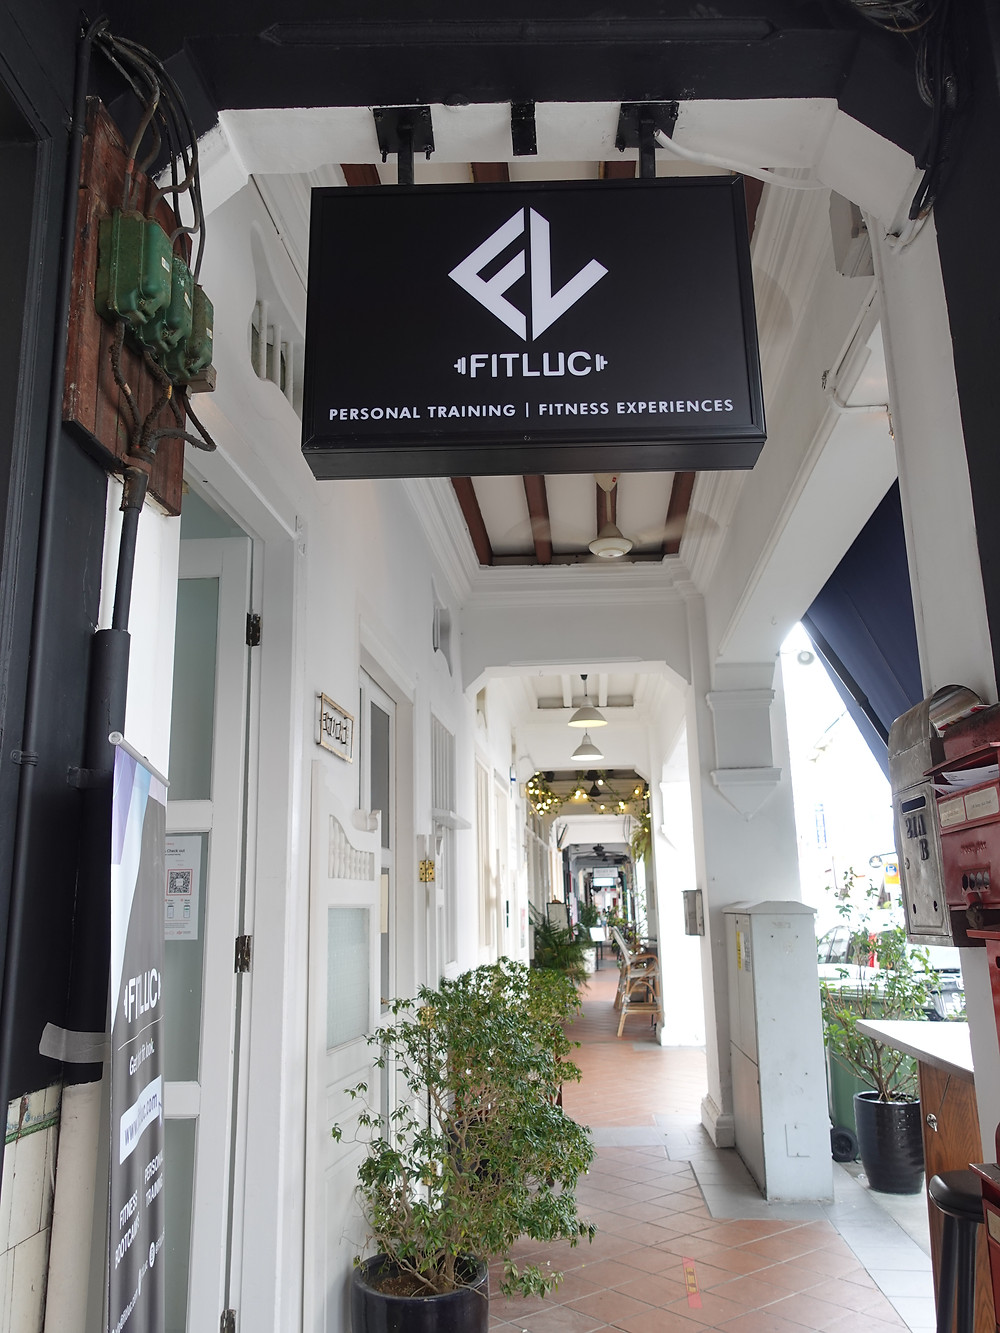 fitluc entrance signage